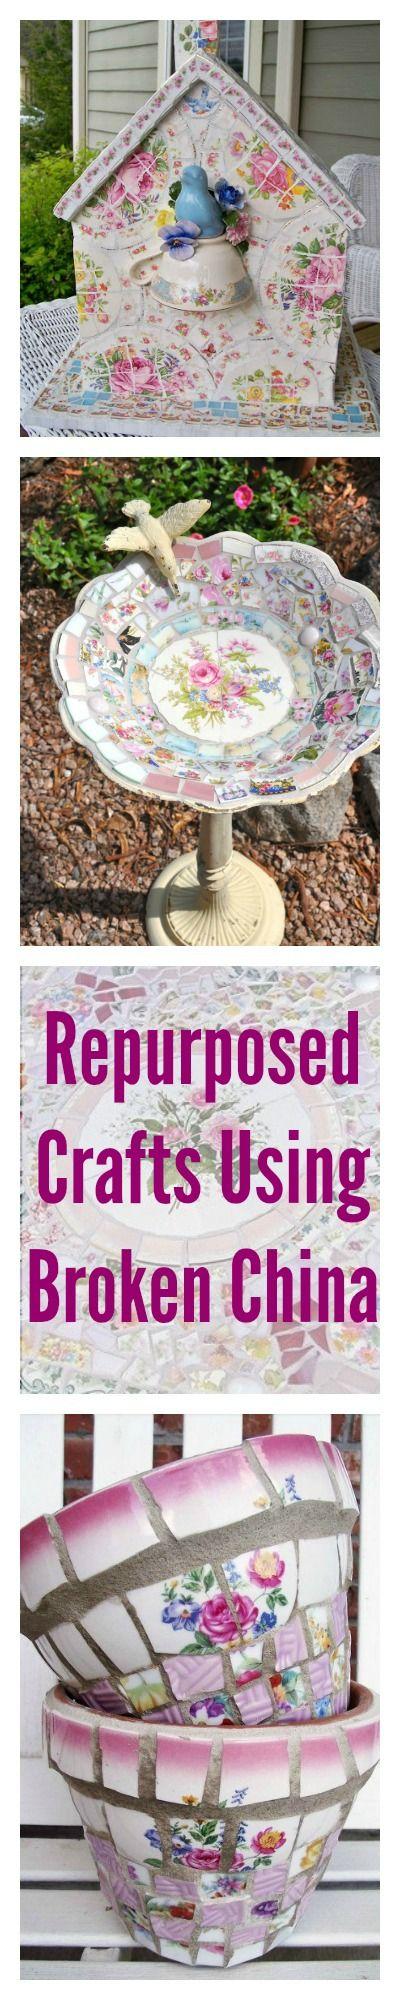 12 Creative Crafts that Take Broken China From Trash to TreasureRuth Neitzel Beaver